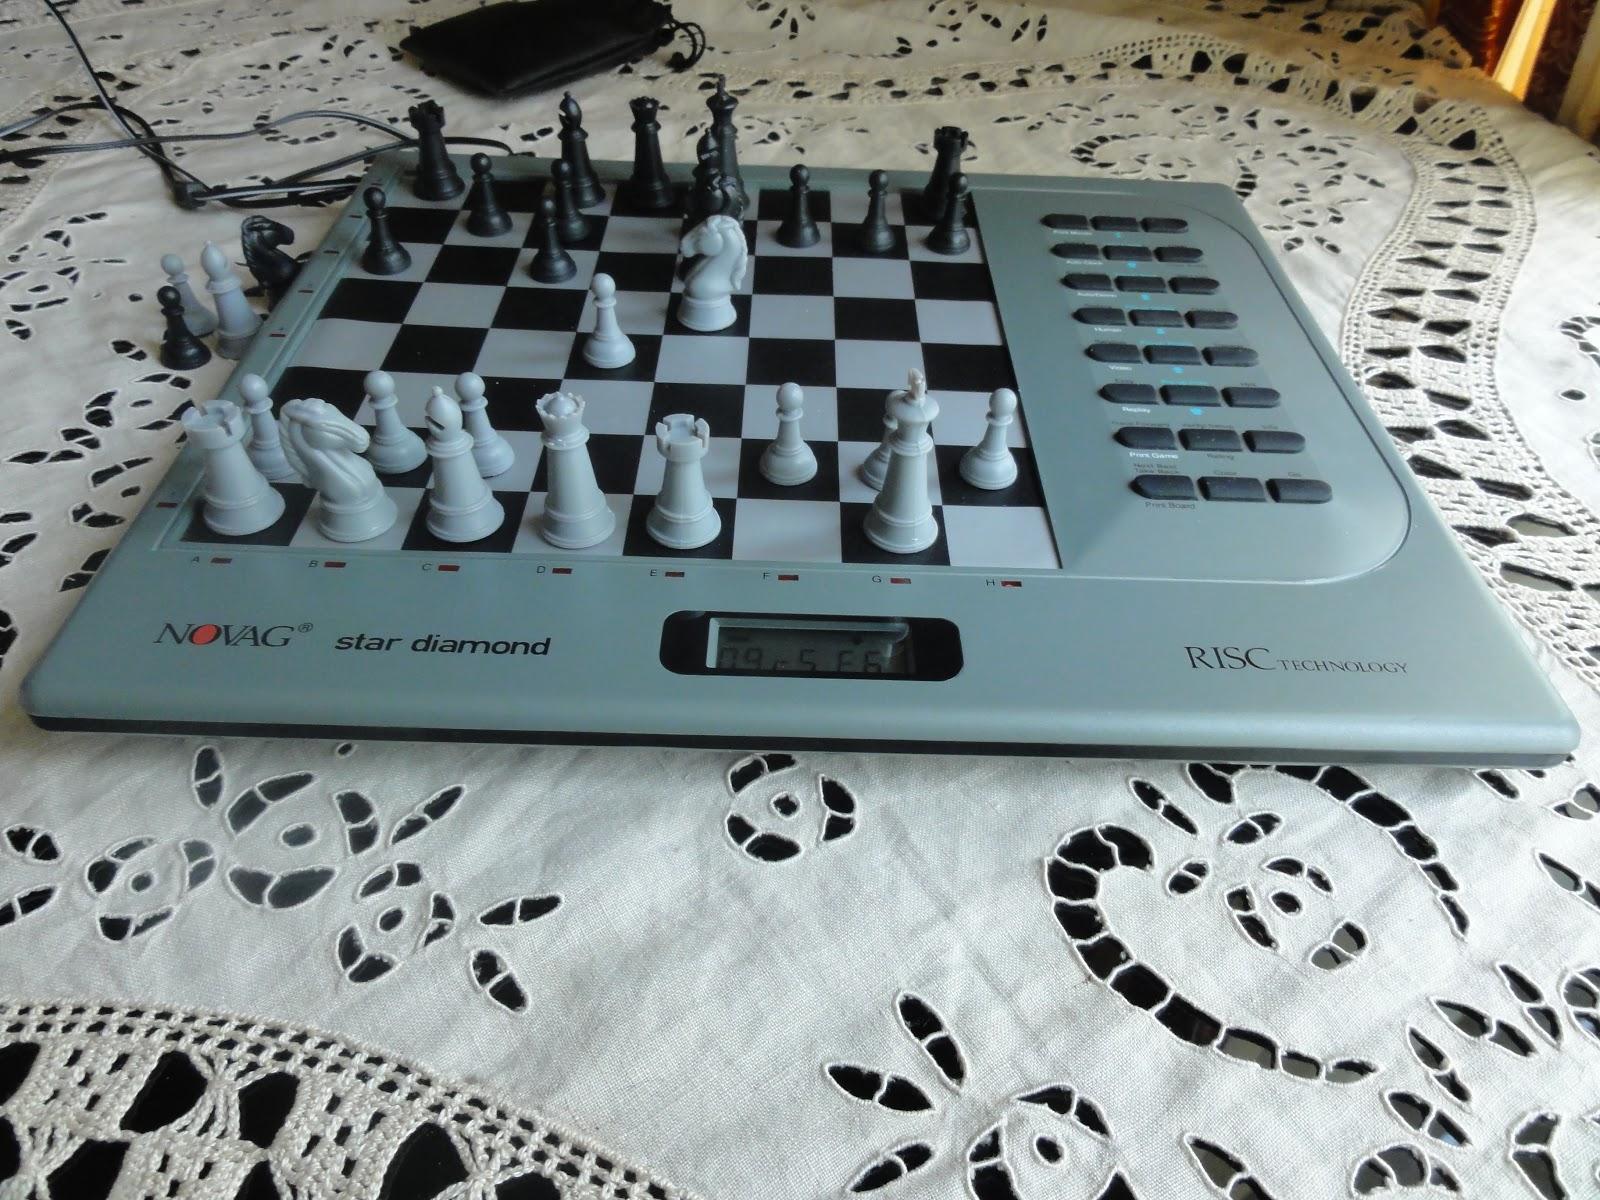 Milady and my dedicated chess computers: Novag Star Diamond